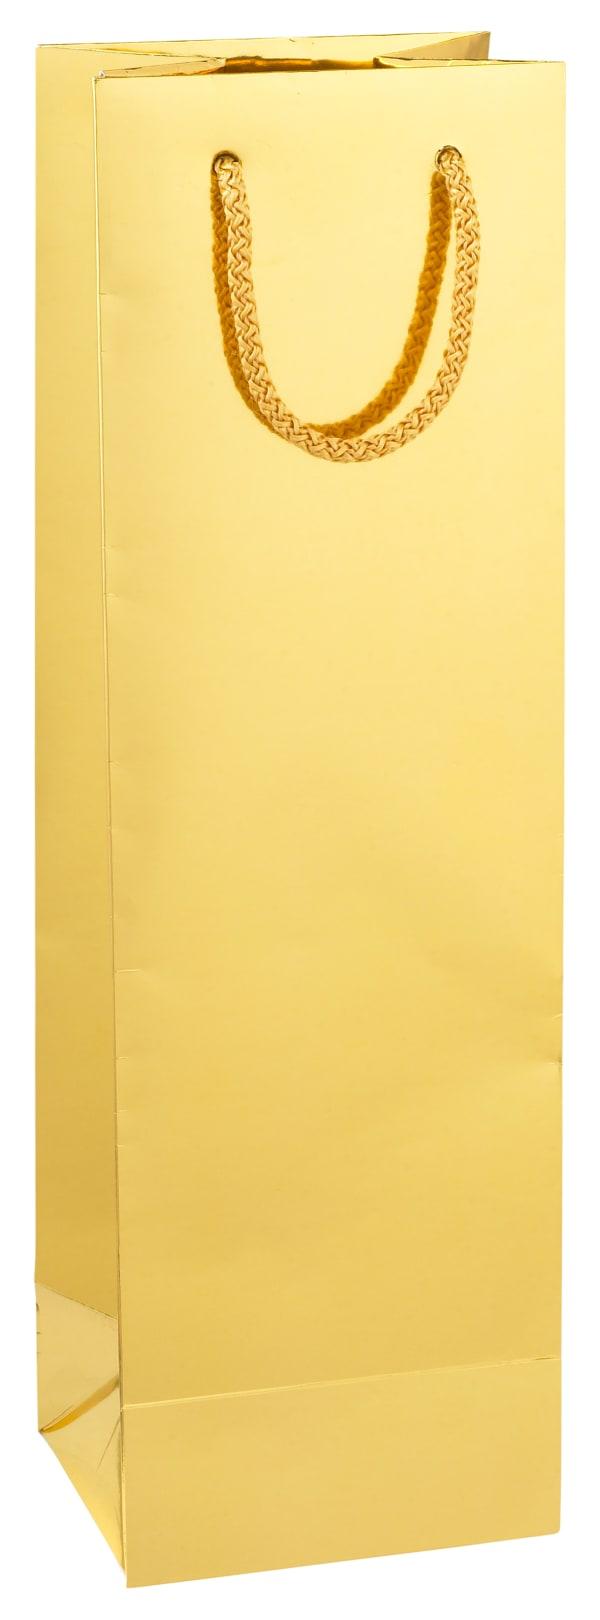 Presentpåse Guld